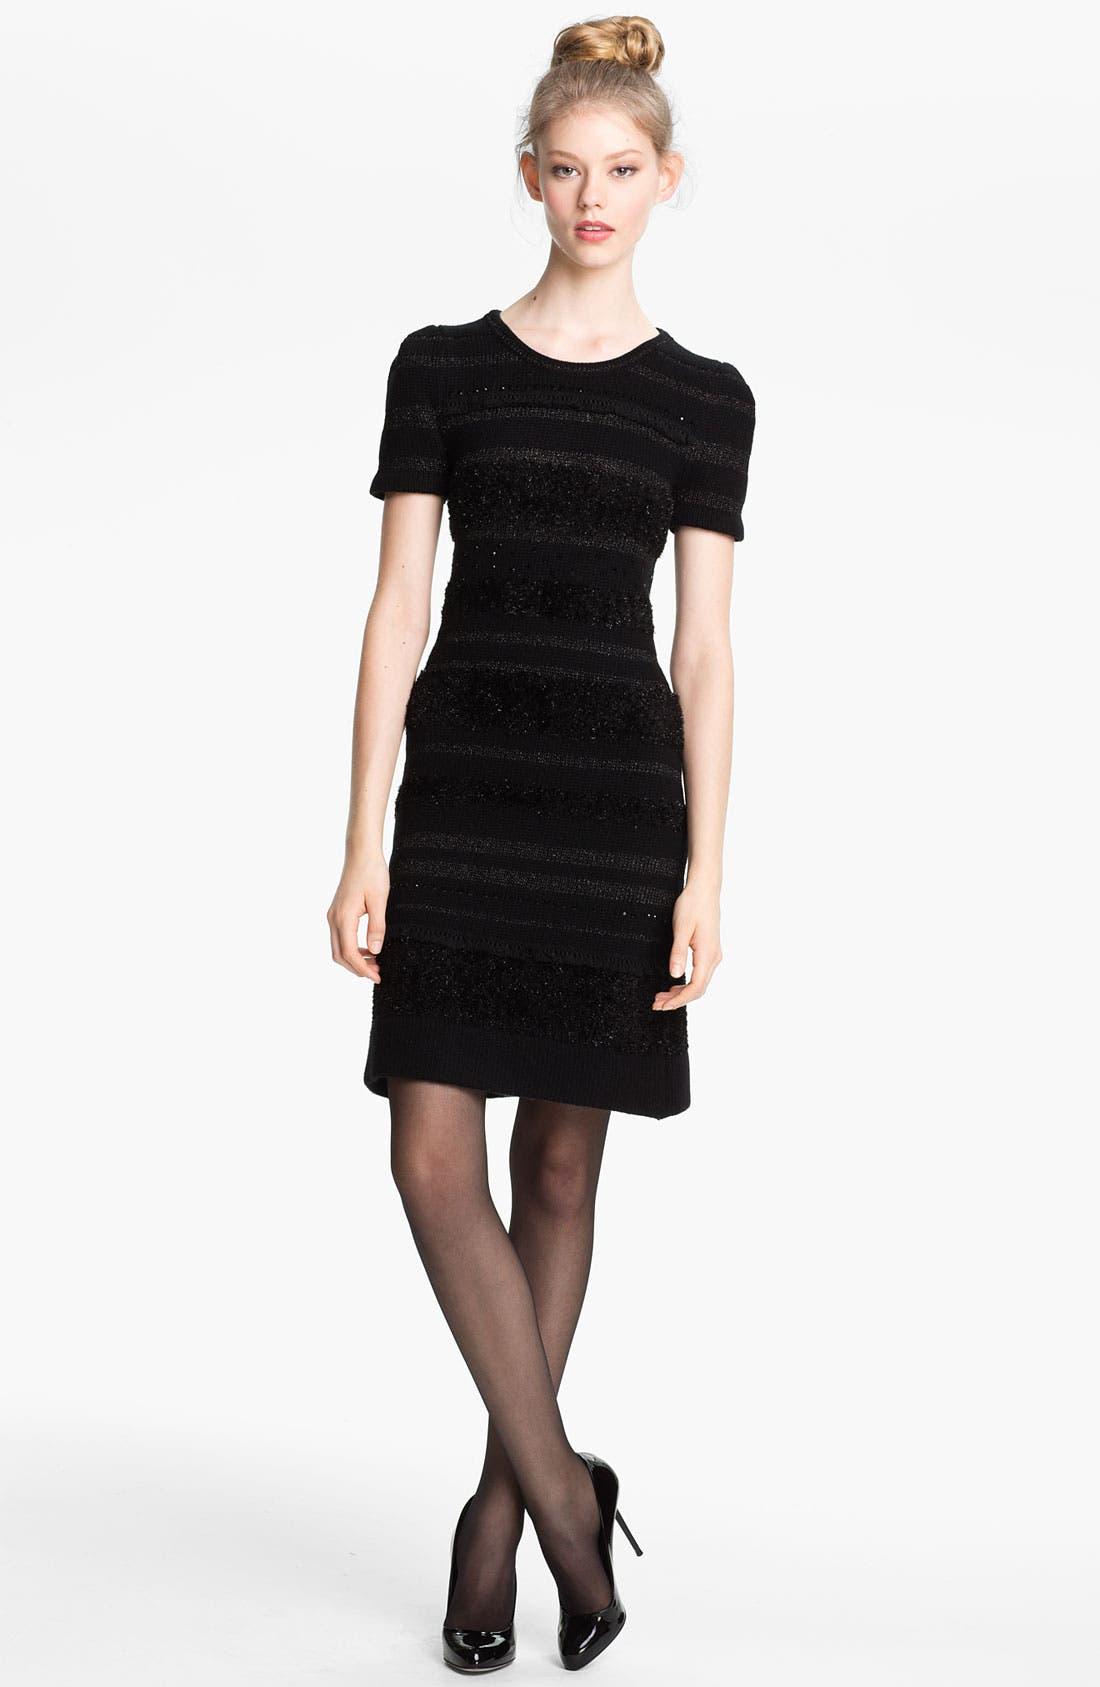 Alternate Image 1 Selected - Mcginn 'Alicia' Bead & Fringe Embellished Sweater Dress